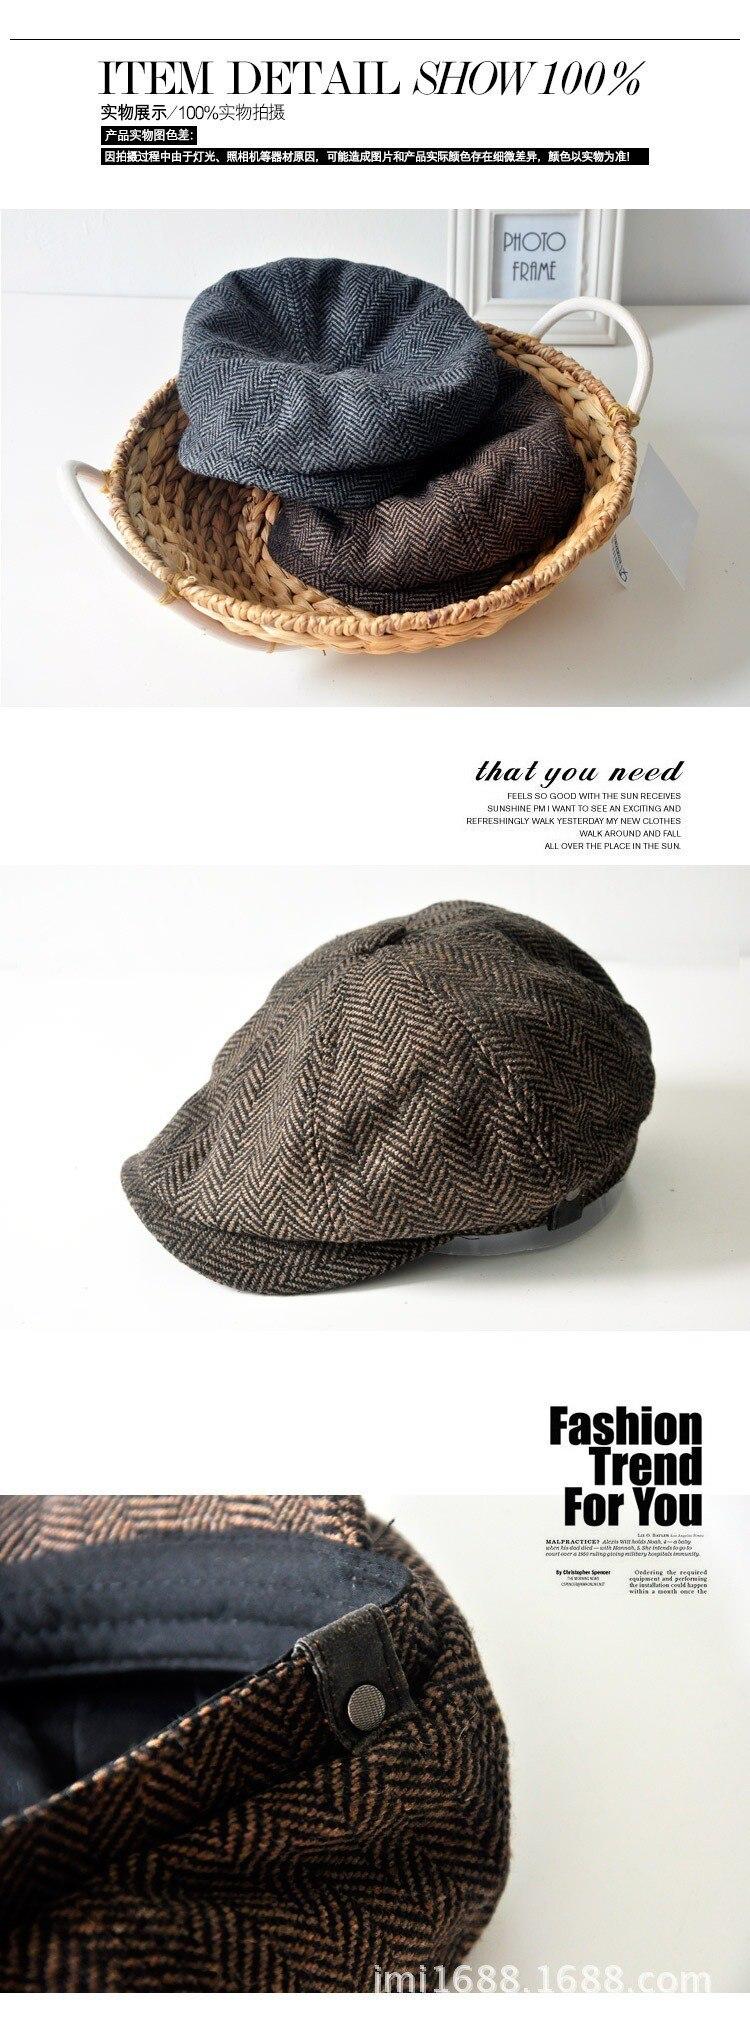 45aeb42b8ca56d HTB1v0vJHFXXXXbeXVXXq6xXFXXXI HERRINGBONE TWEED GATSBY Newsboy Cap Men Wool  Ivy Hat Golf Driving Flat Cabbie flat hat